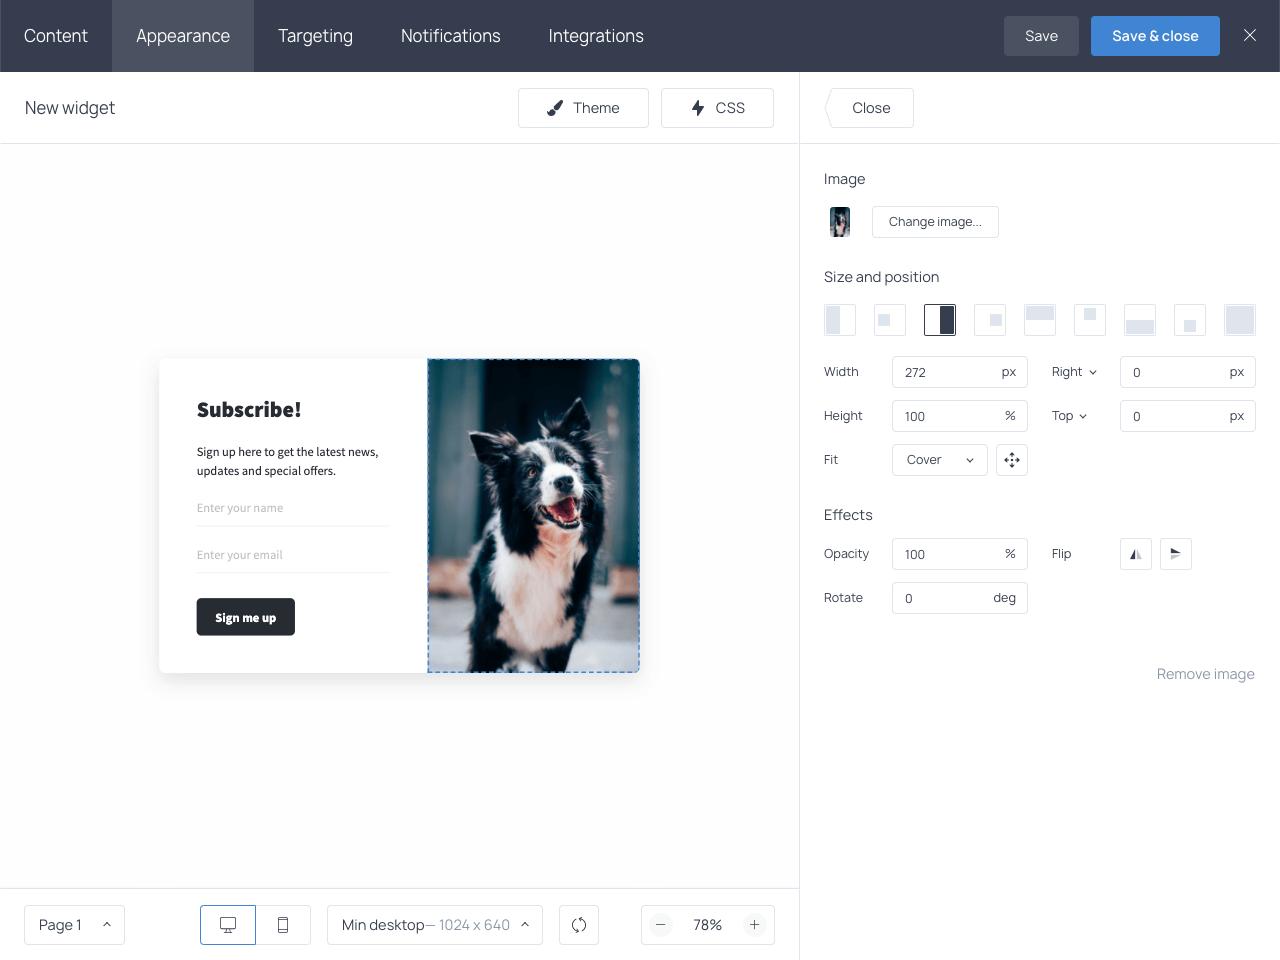 Showcasing user-friendly image settings in the Getsitecontrol dashboard